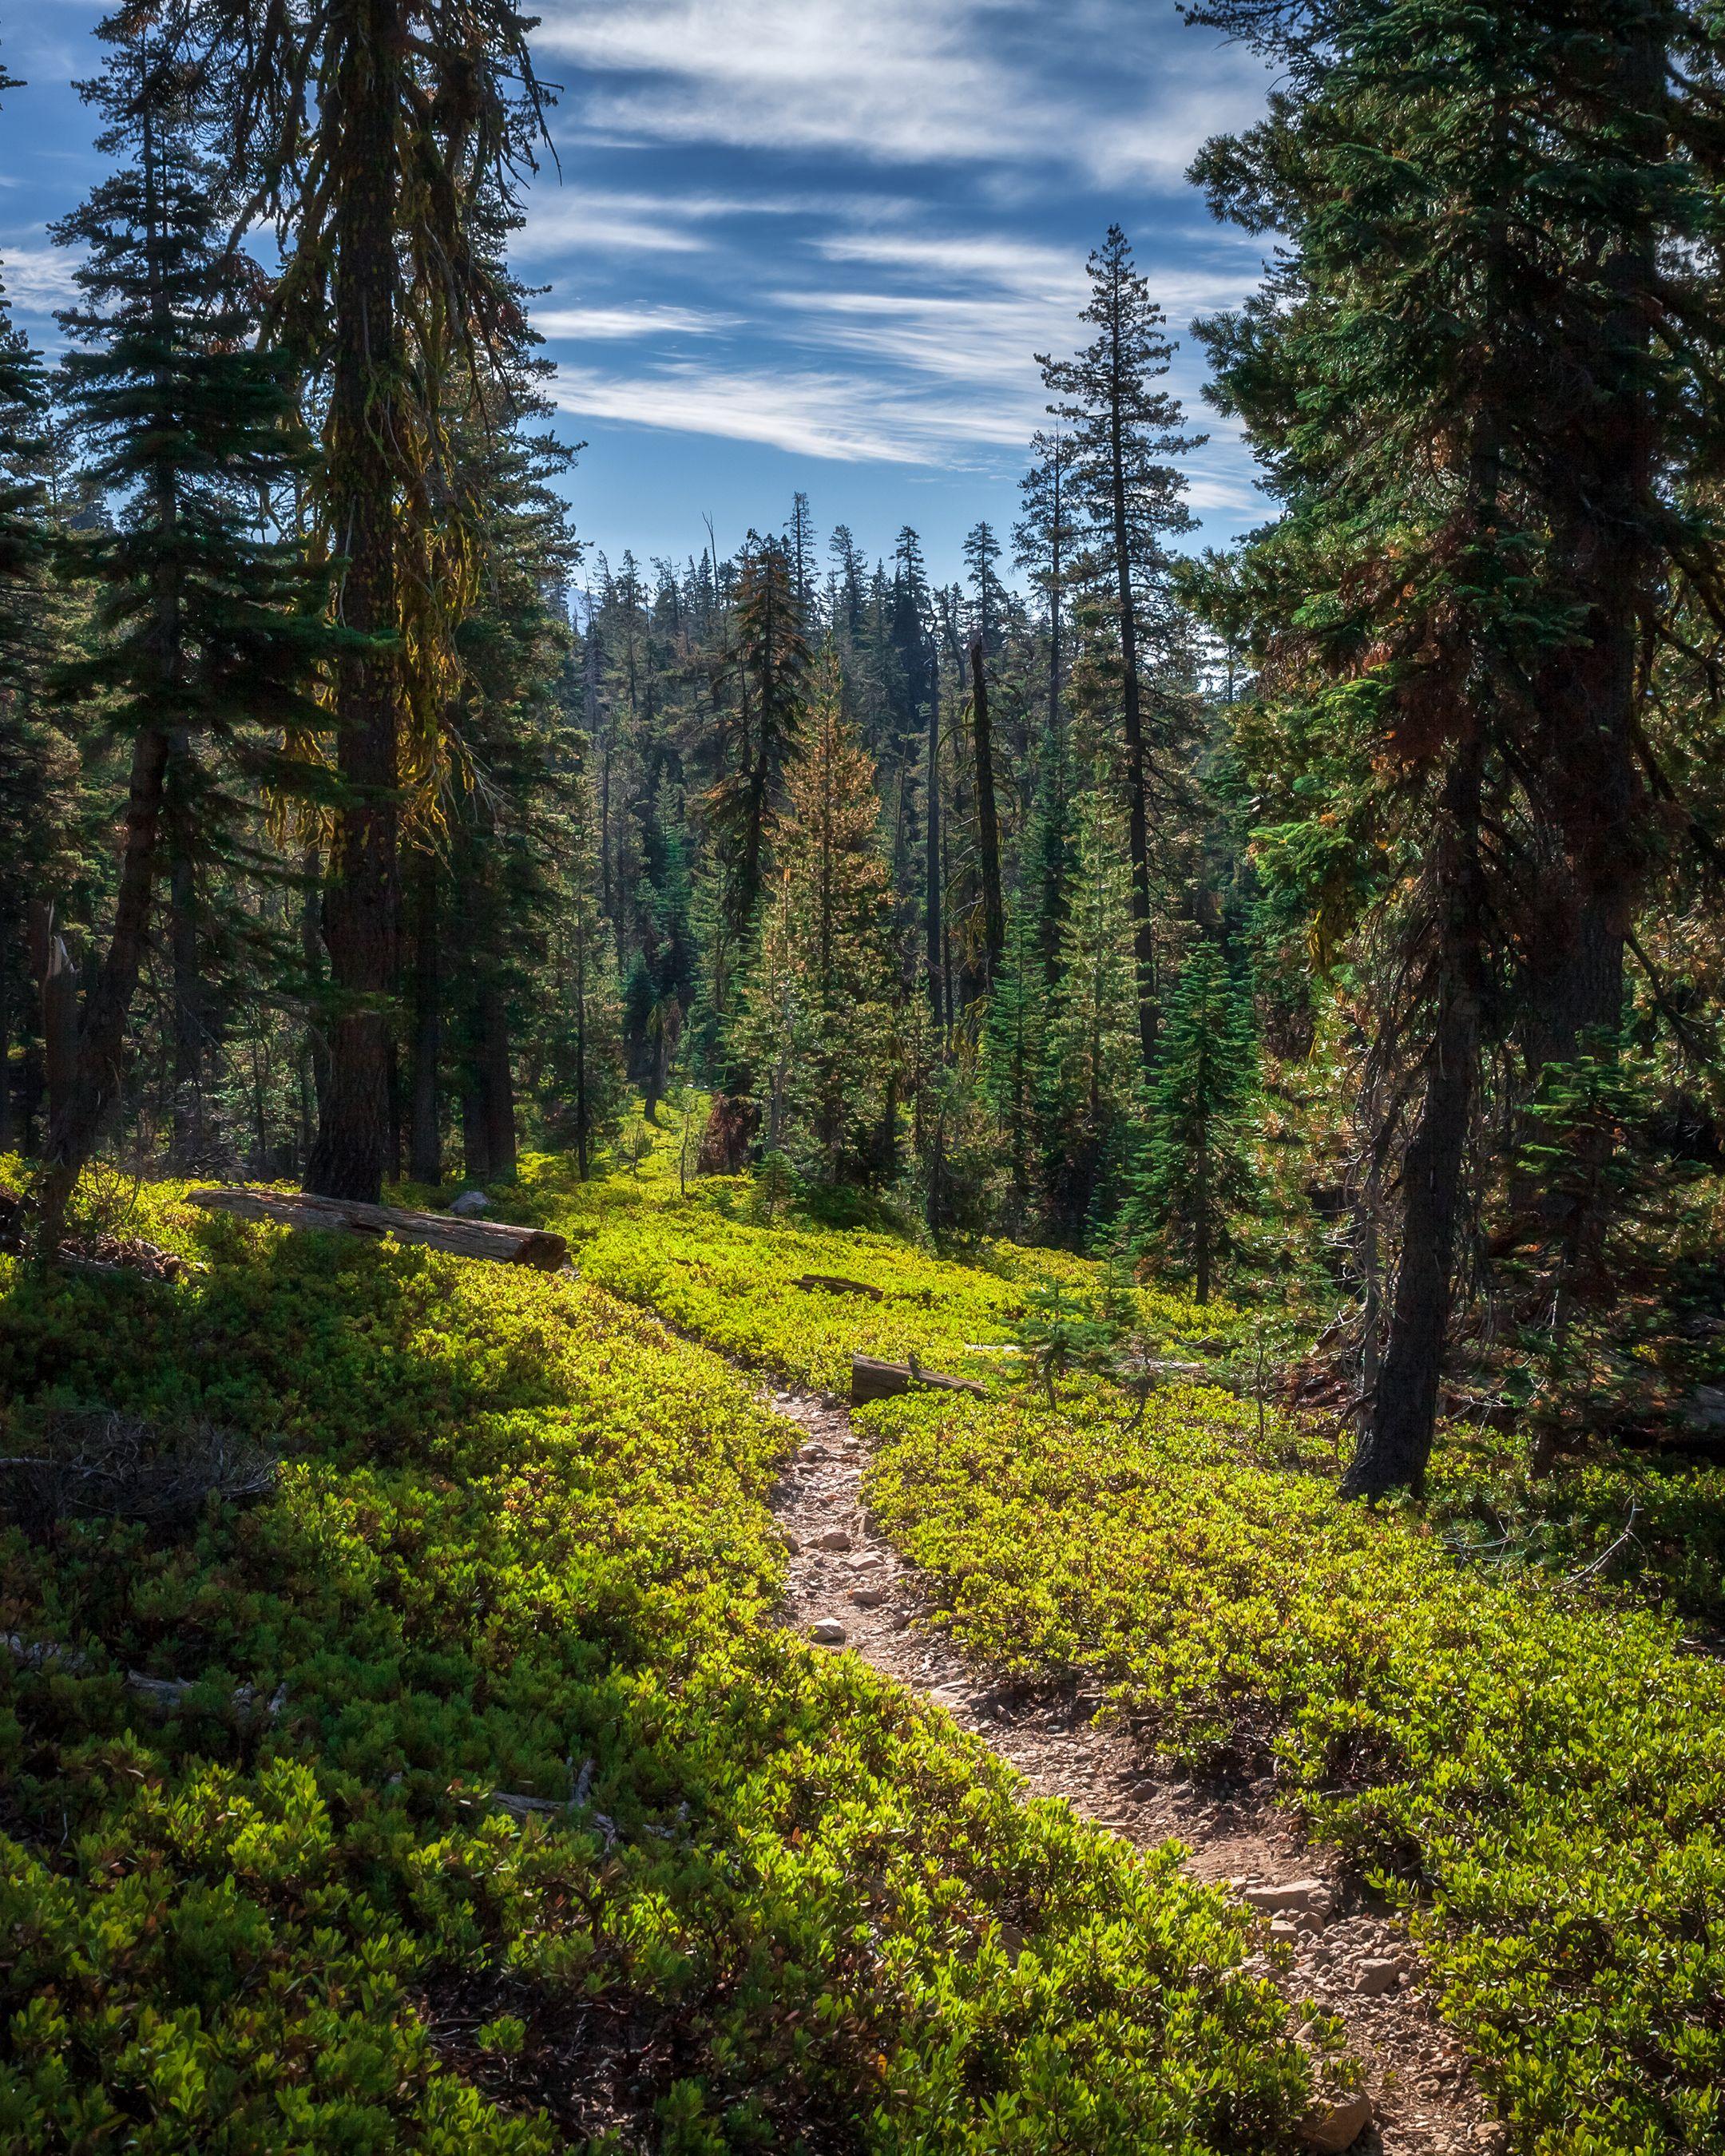 Lush Sub Alpine Forest In Lassen Volcanic Np 2160x2700 Mountain Landscape Photography Forest Landscape Landscape Photography